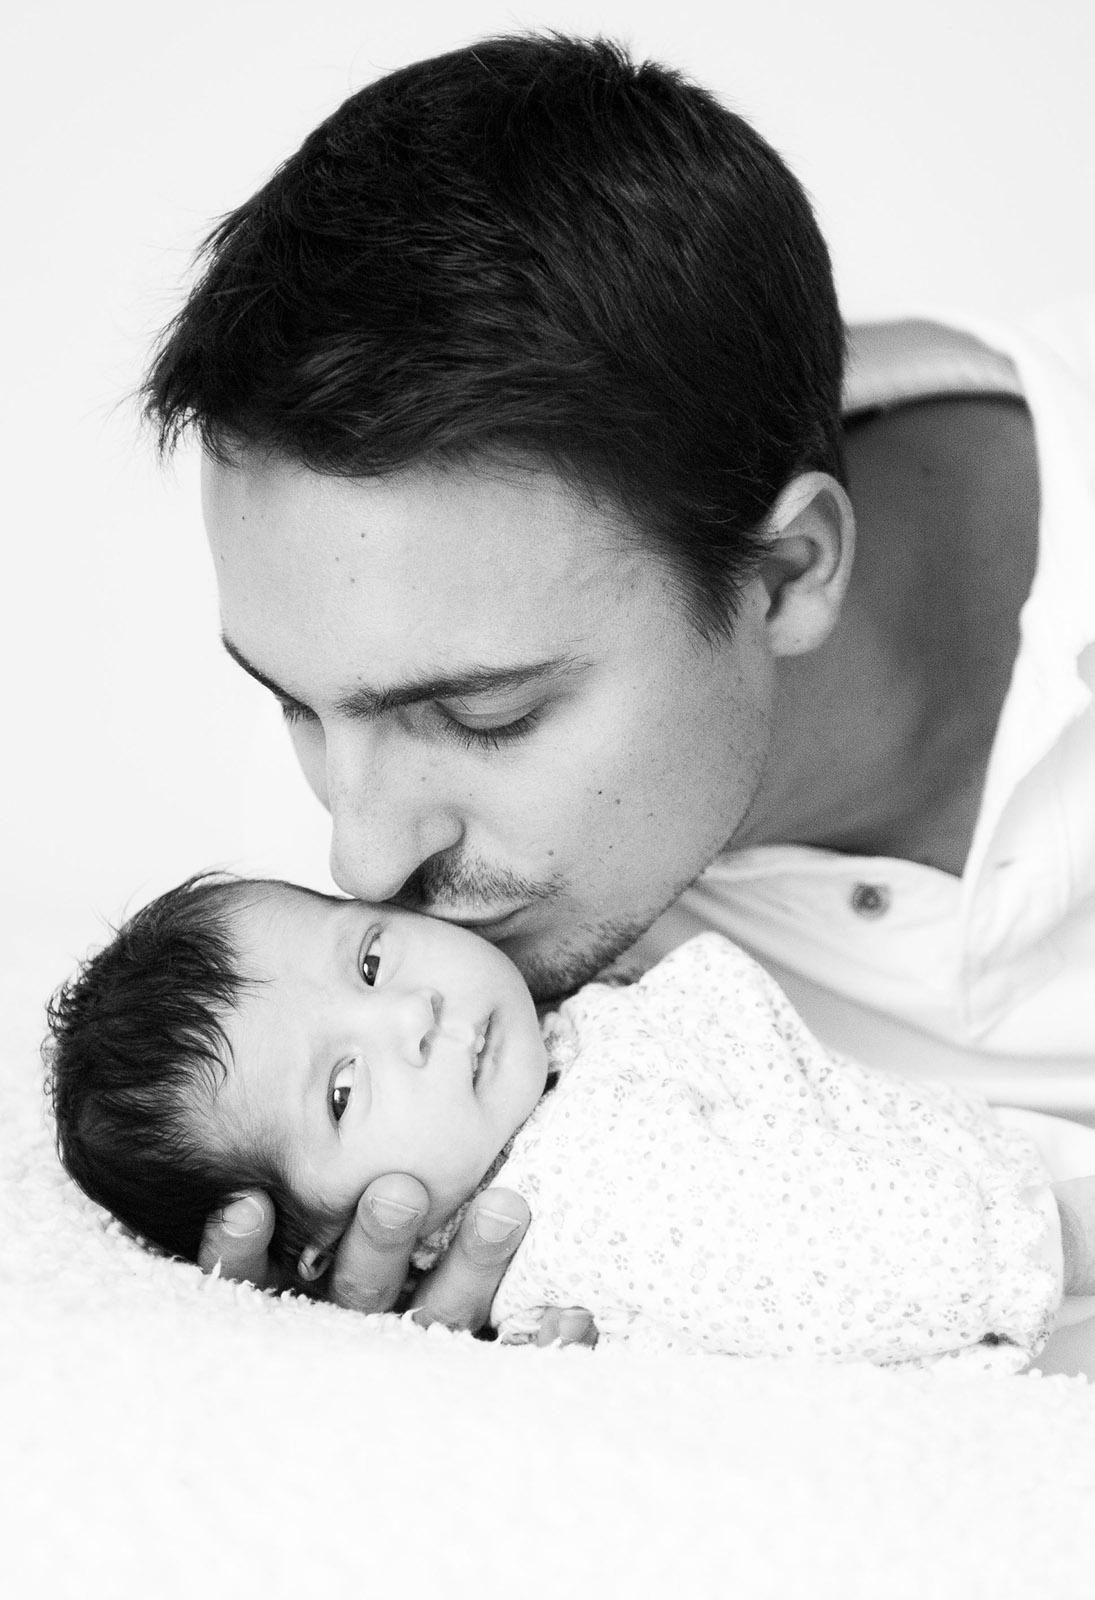 seance-photo-famille-photo-grossesse-photo-bébé-naissance-sabrina-godemert-photographe-seine-et-marne027